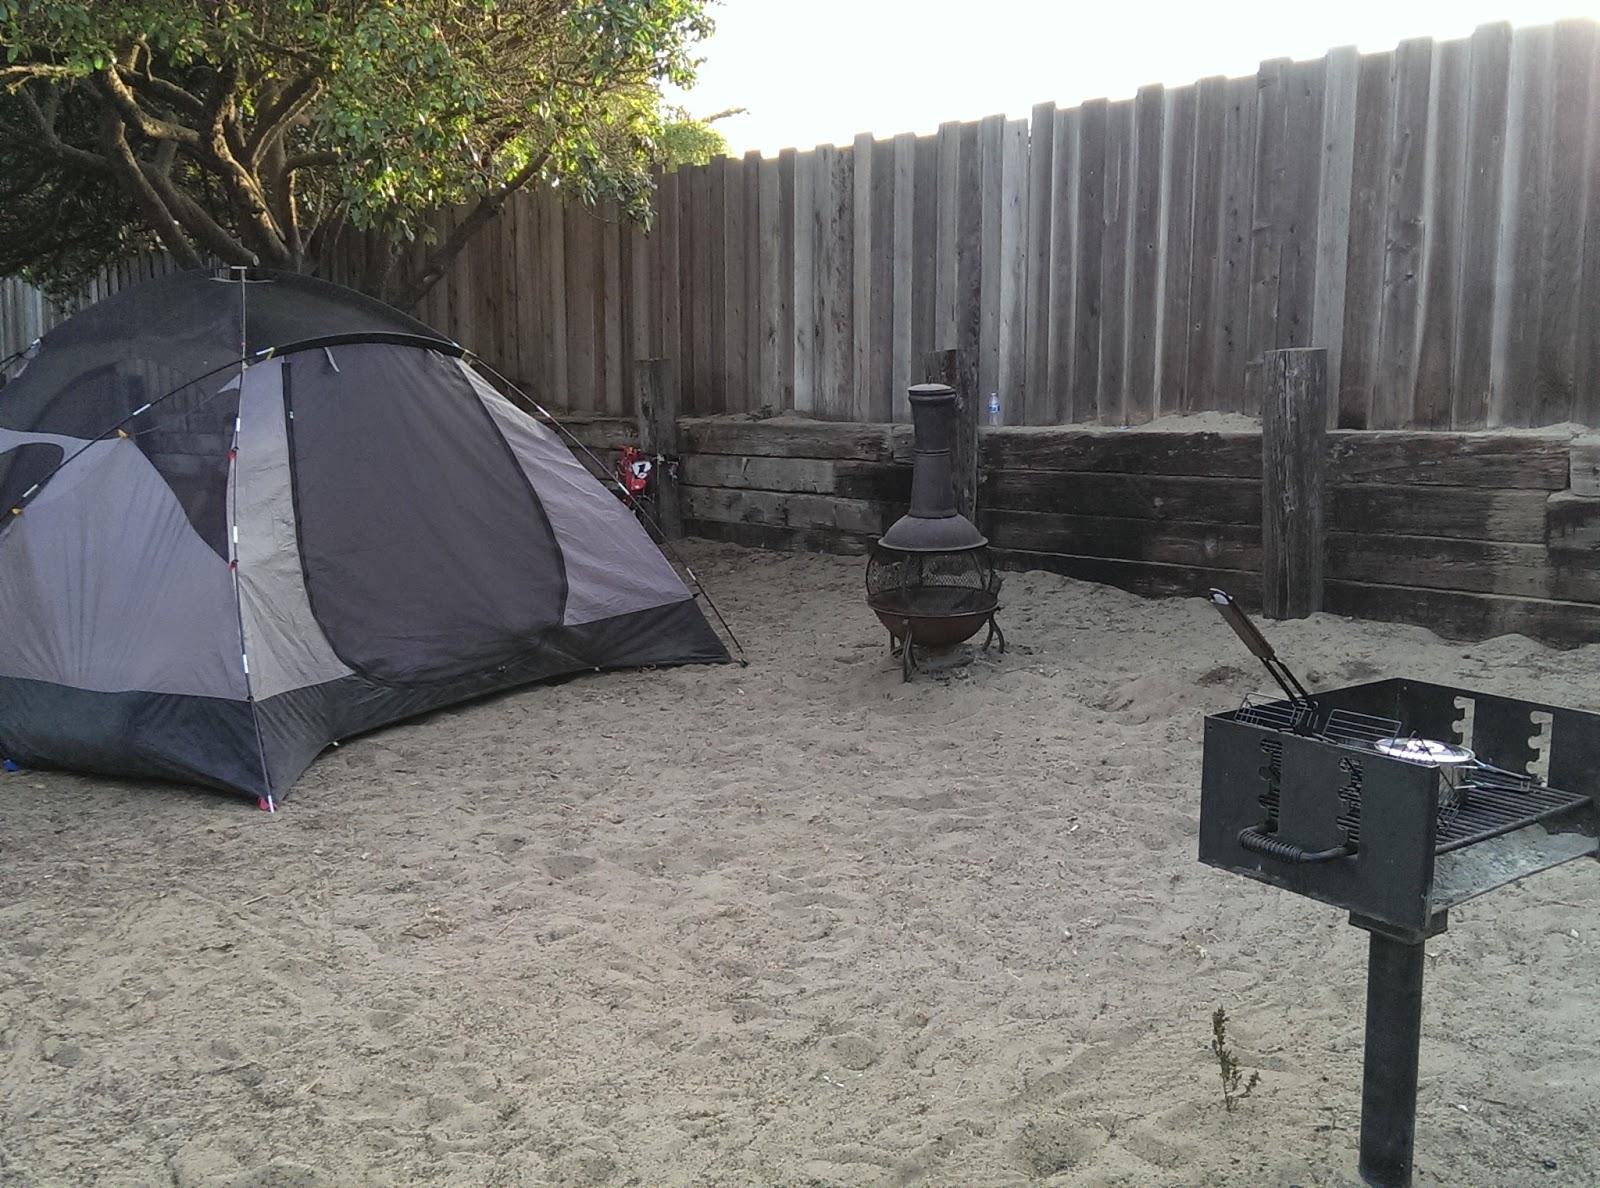 Monterey. Camping, RVing, Rentals, Marina Dunes, Beach